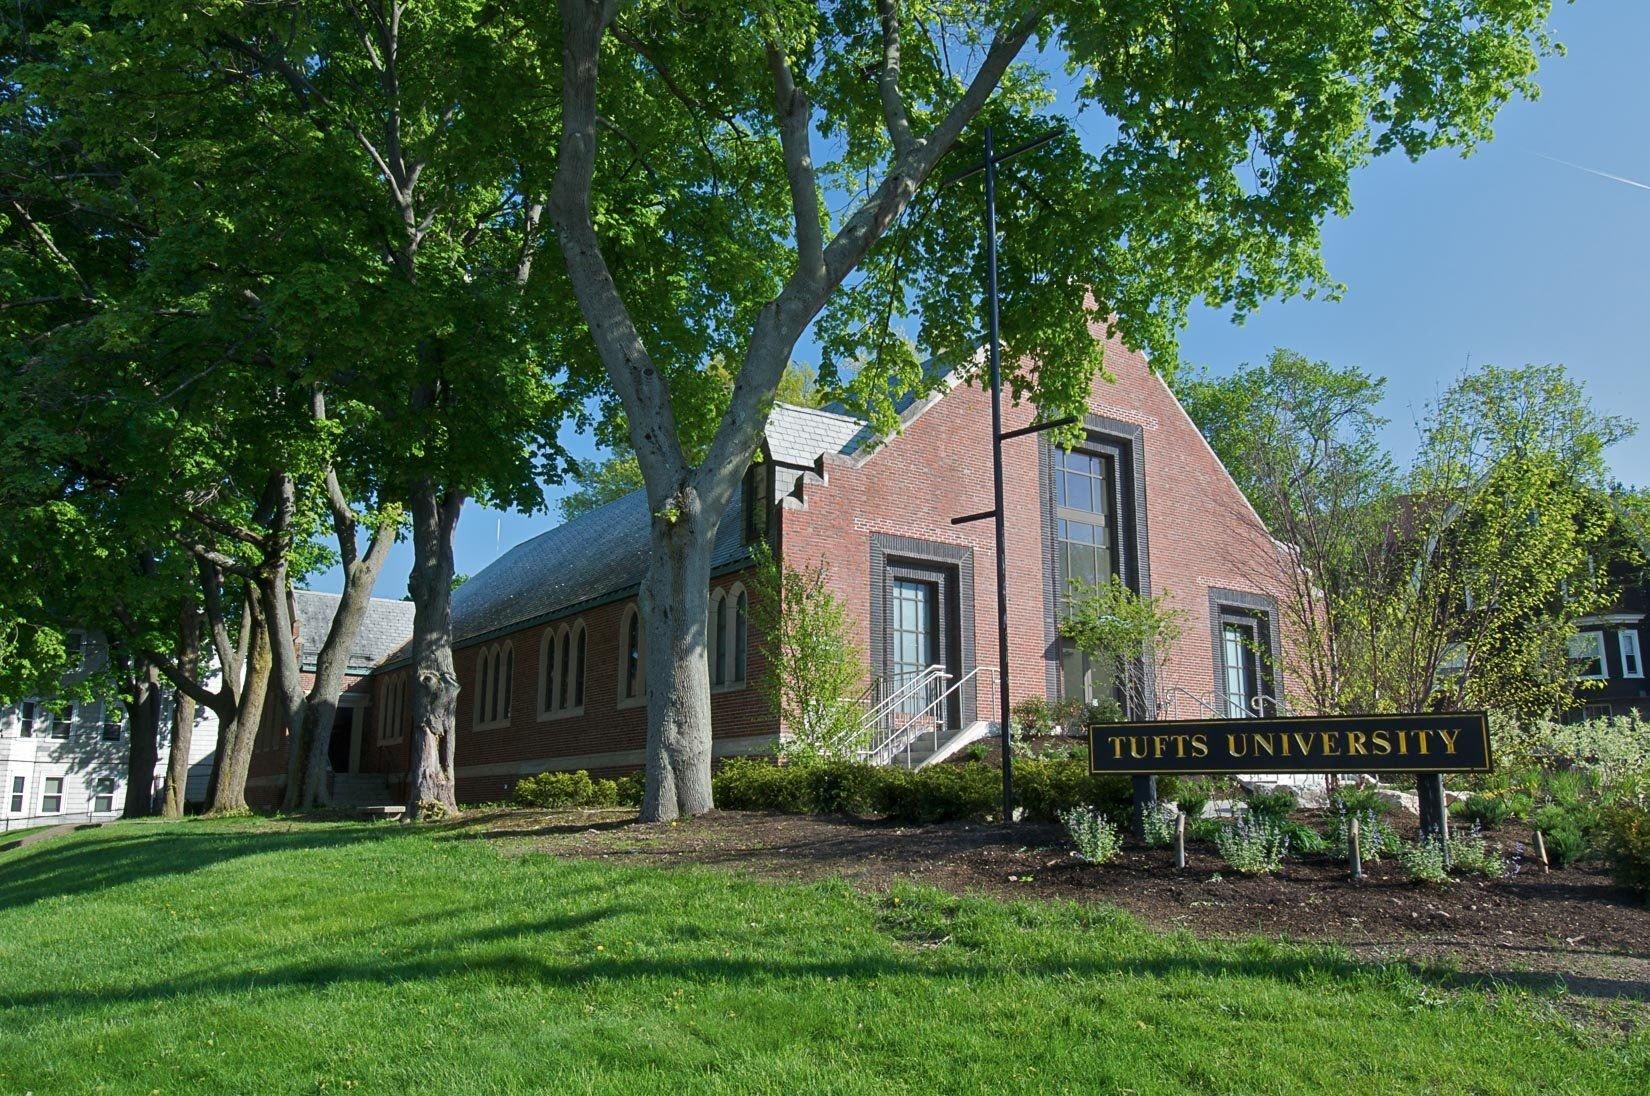 Tufts University, Campus Meeting Center, Exterior view